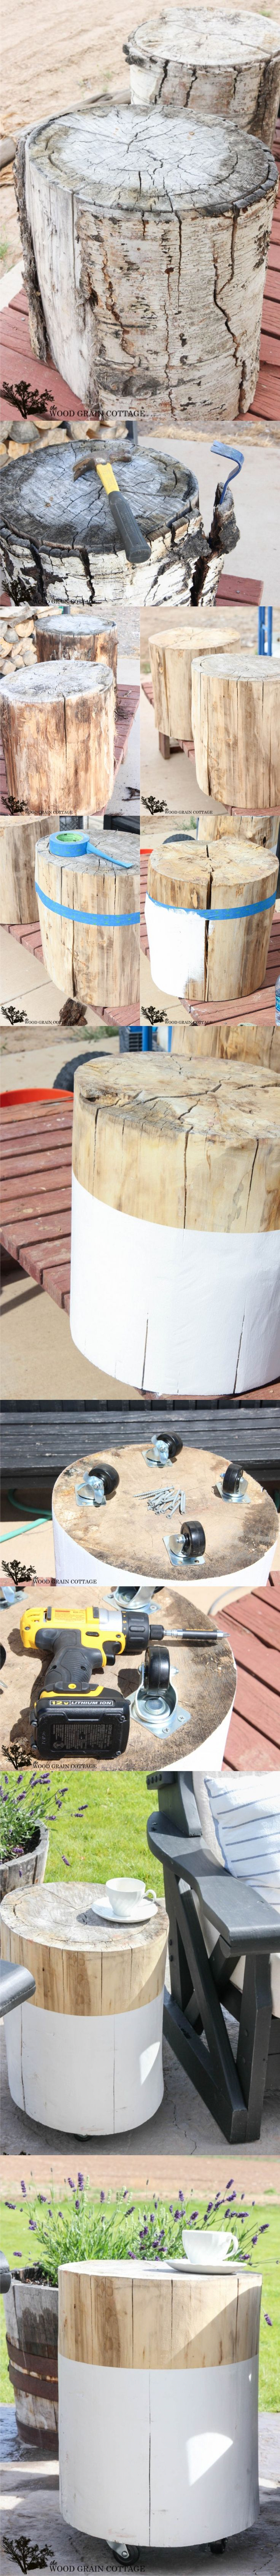 Mesita DIY con un tronco / Vía http://www.thewoodgraincottage.com/: